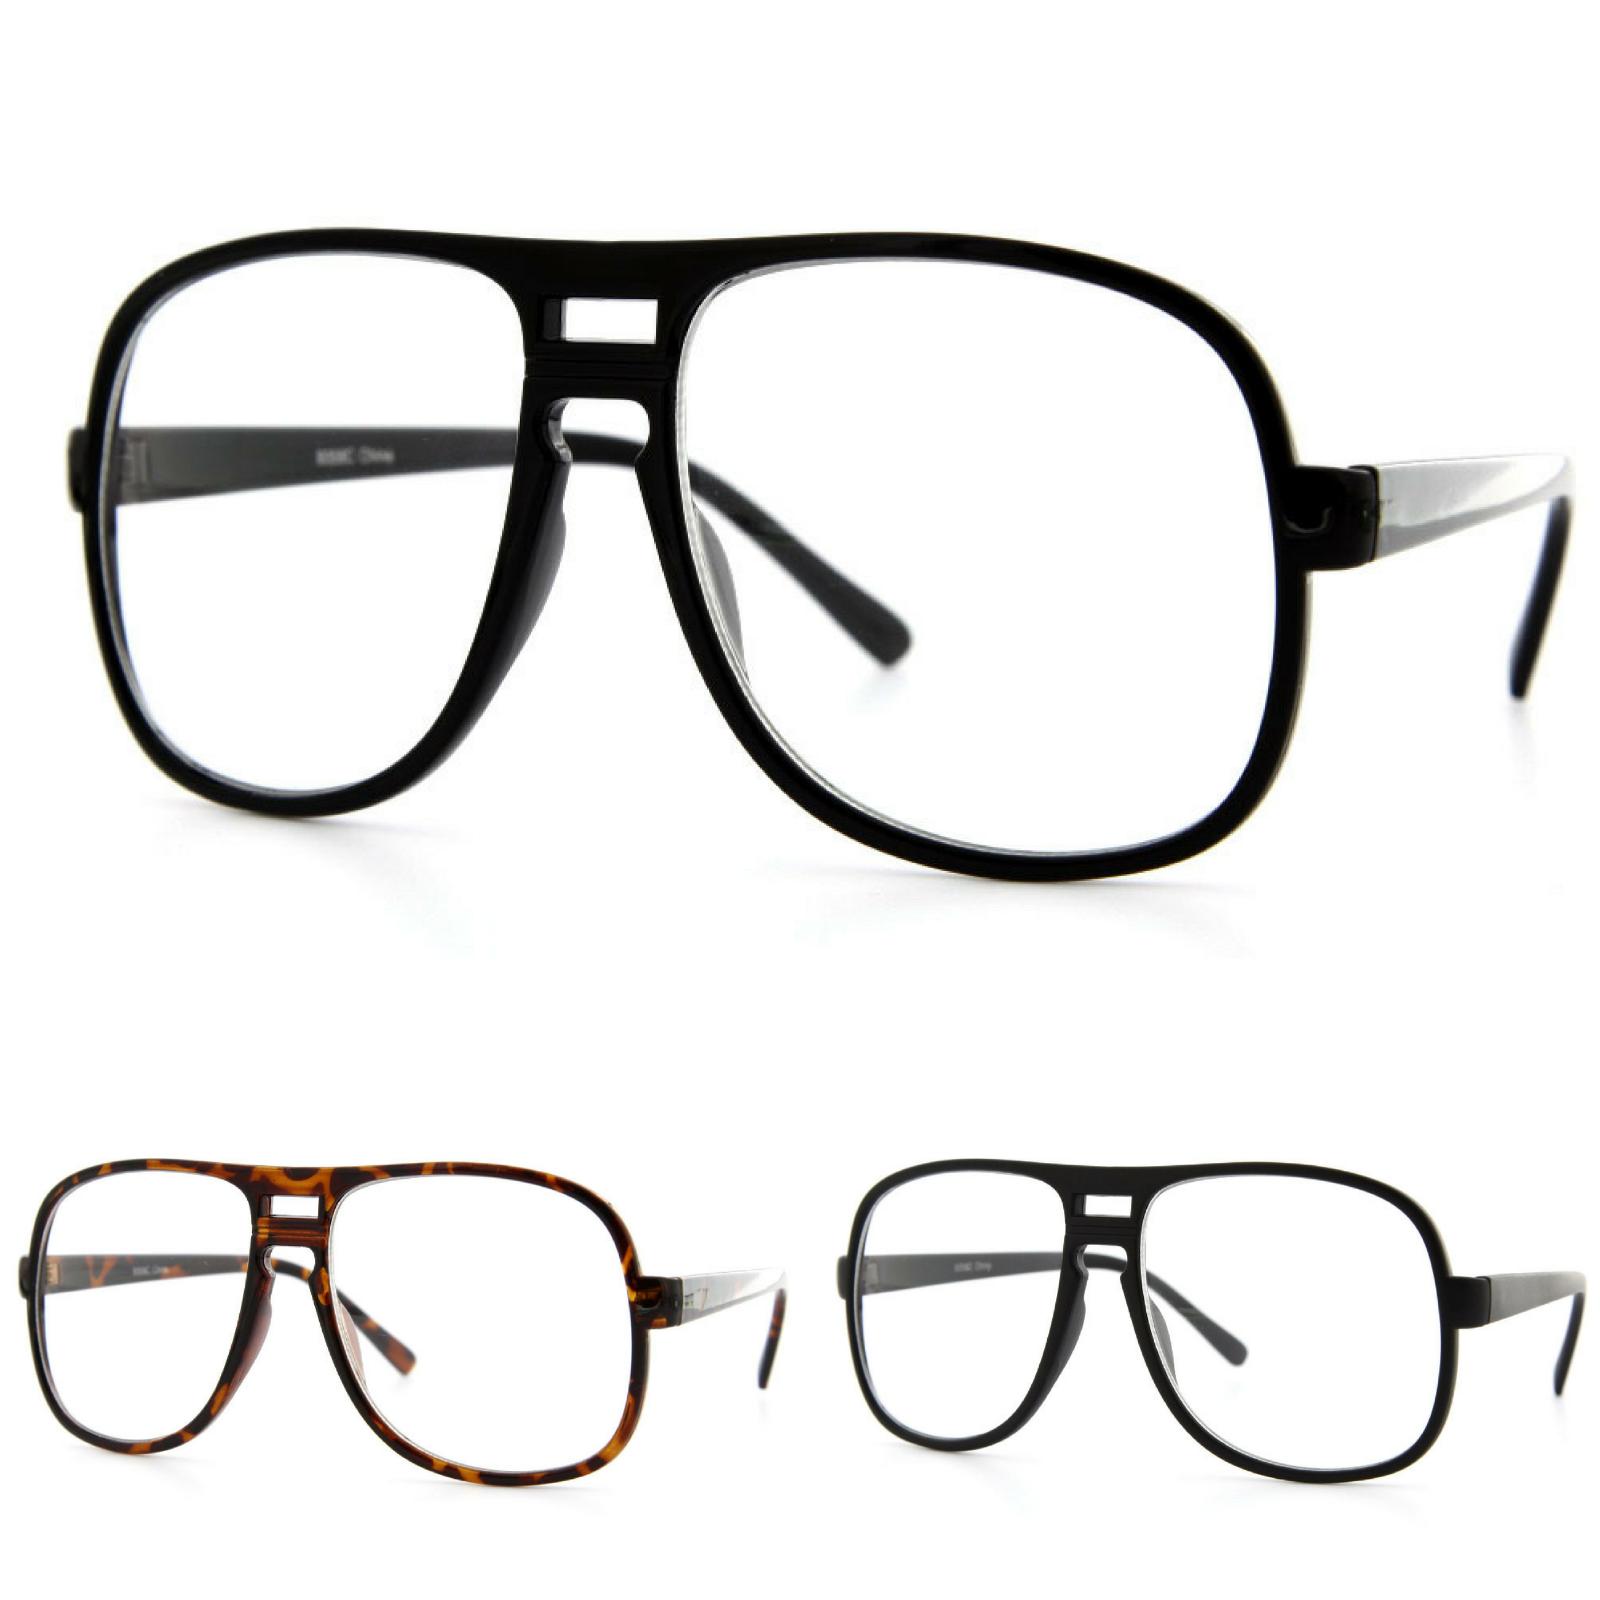 Oversized Sunglasses Eyeglasses Designer Clear Lens Retro Fa